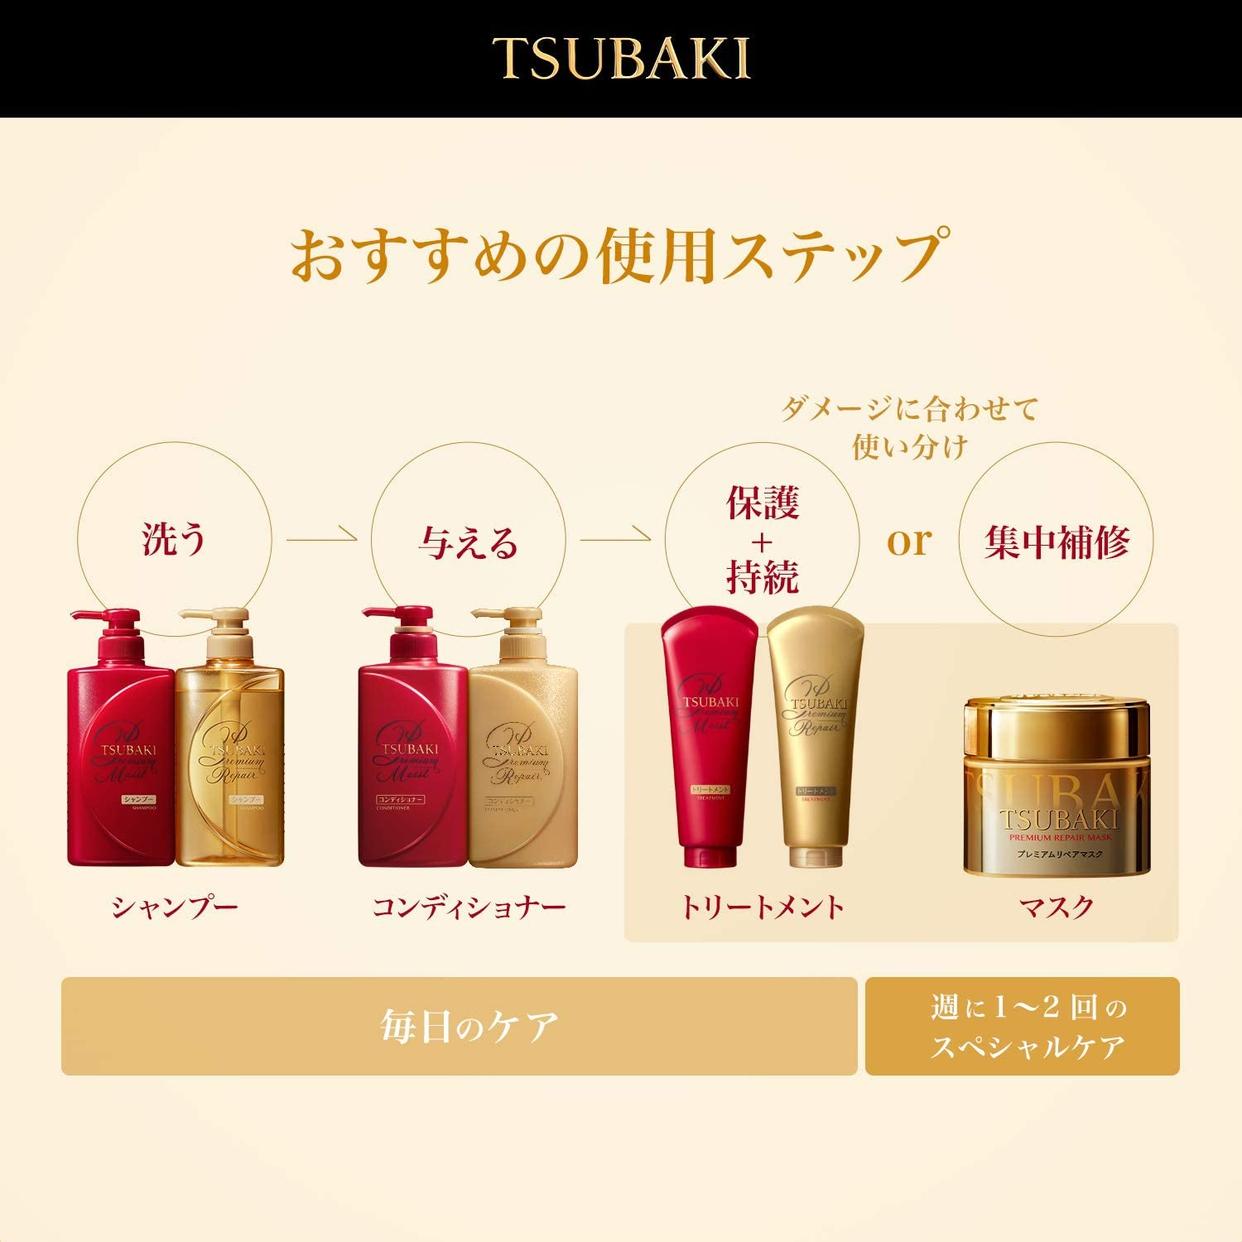 TSUBAKI(ツバキ)プレミアムモイスト ヘアコンディショナーの商品画像6